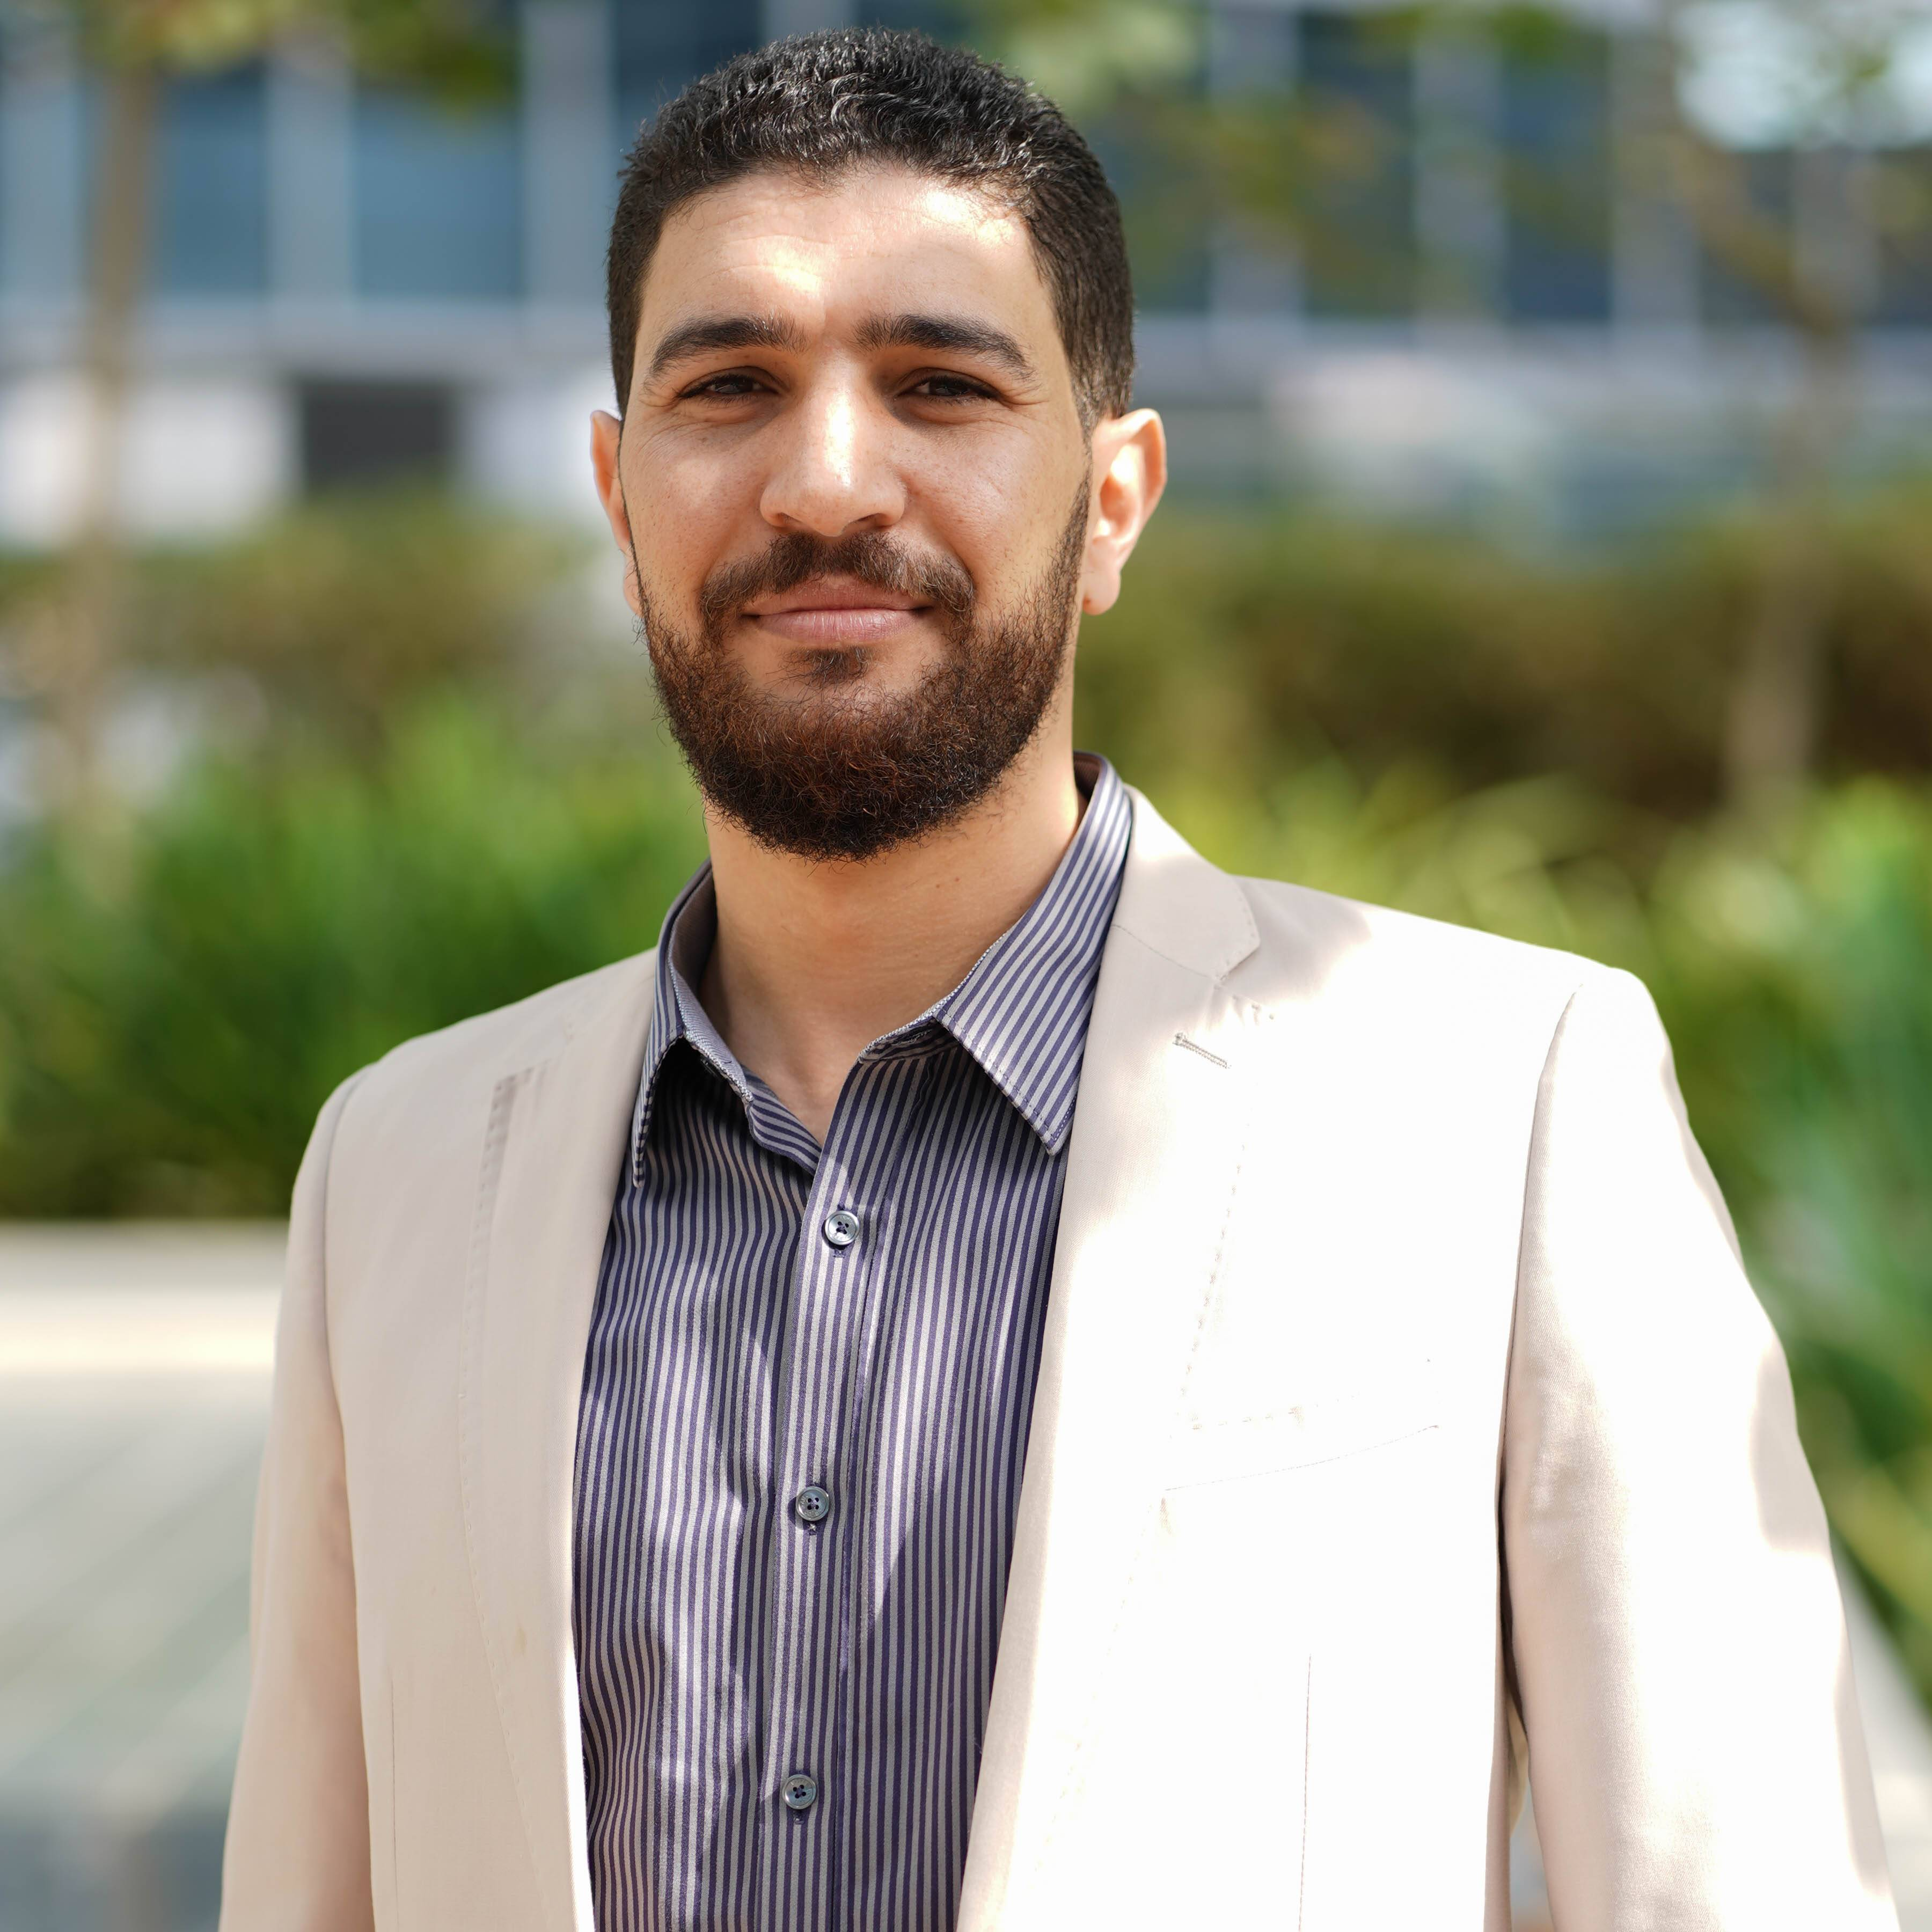 Ahmed Elkouny